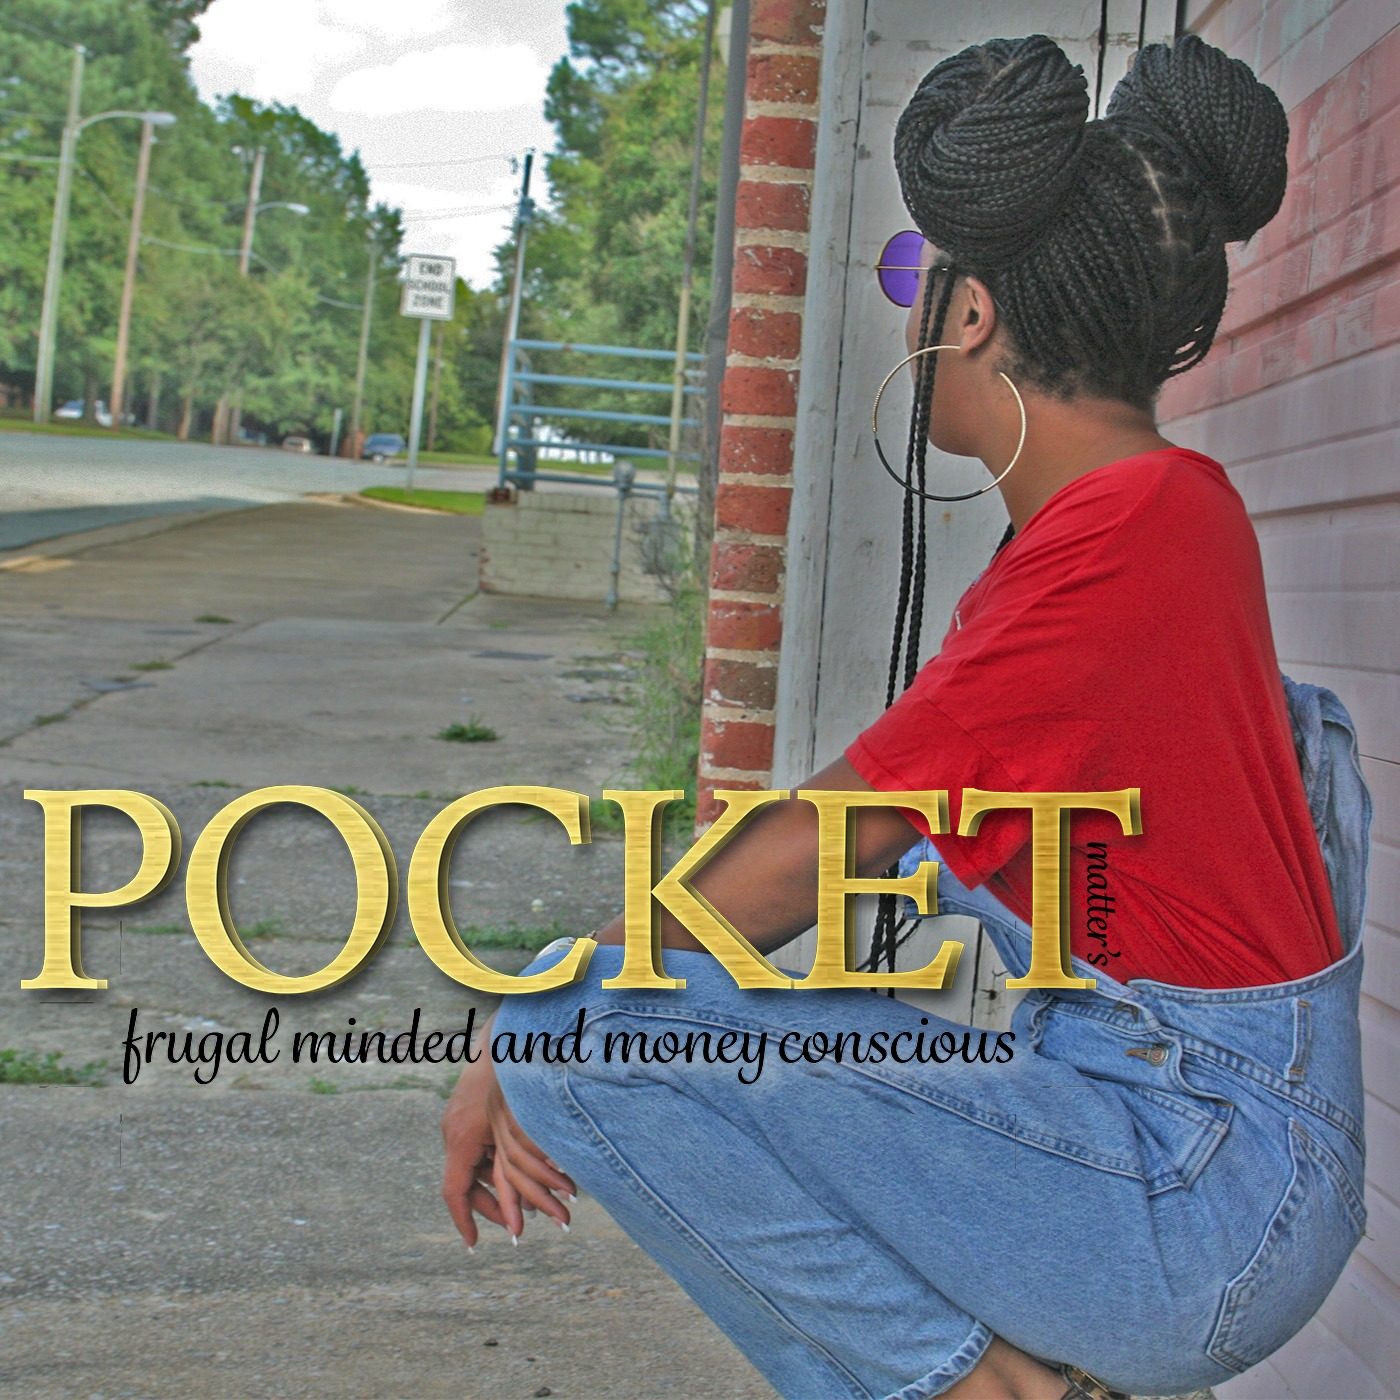 Pocket Matter's